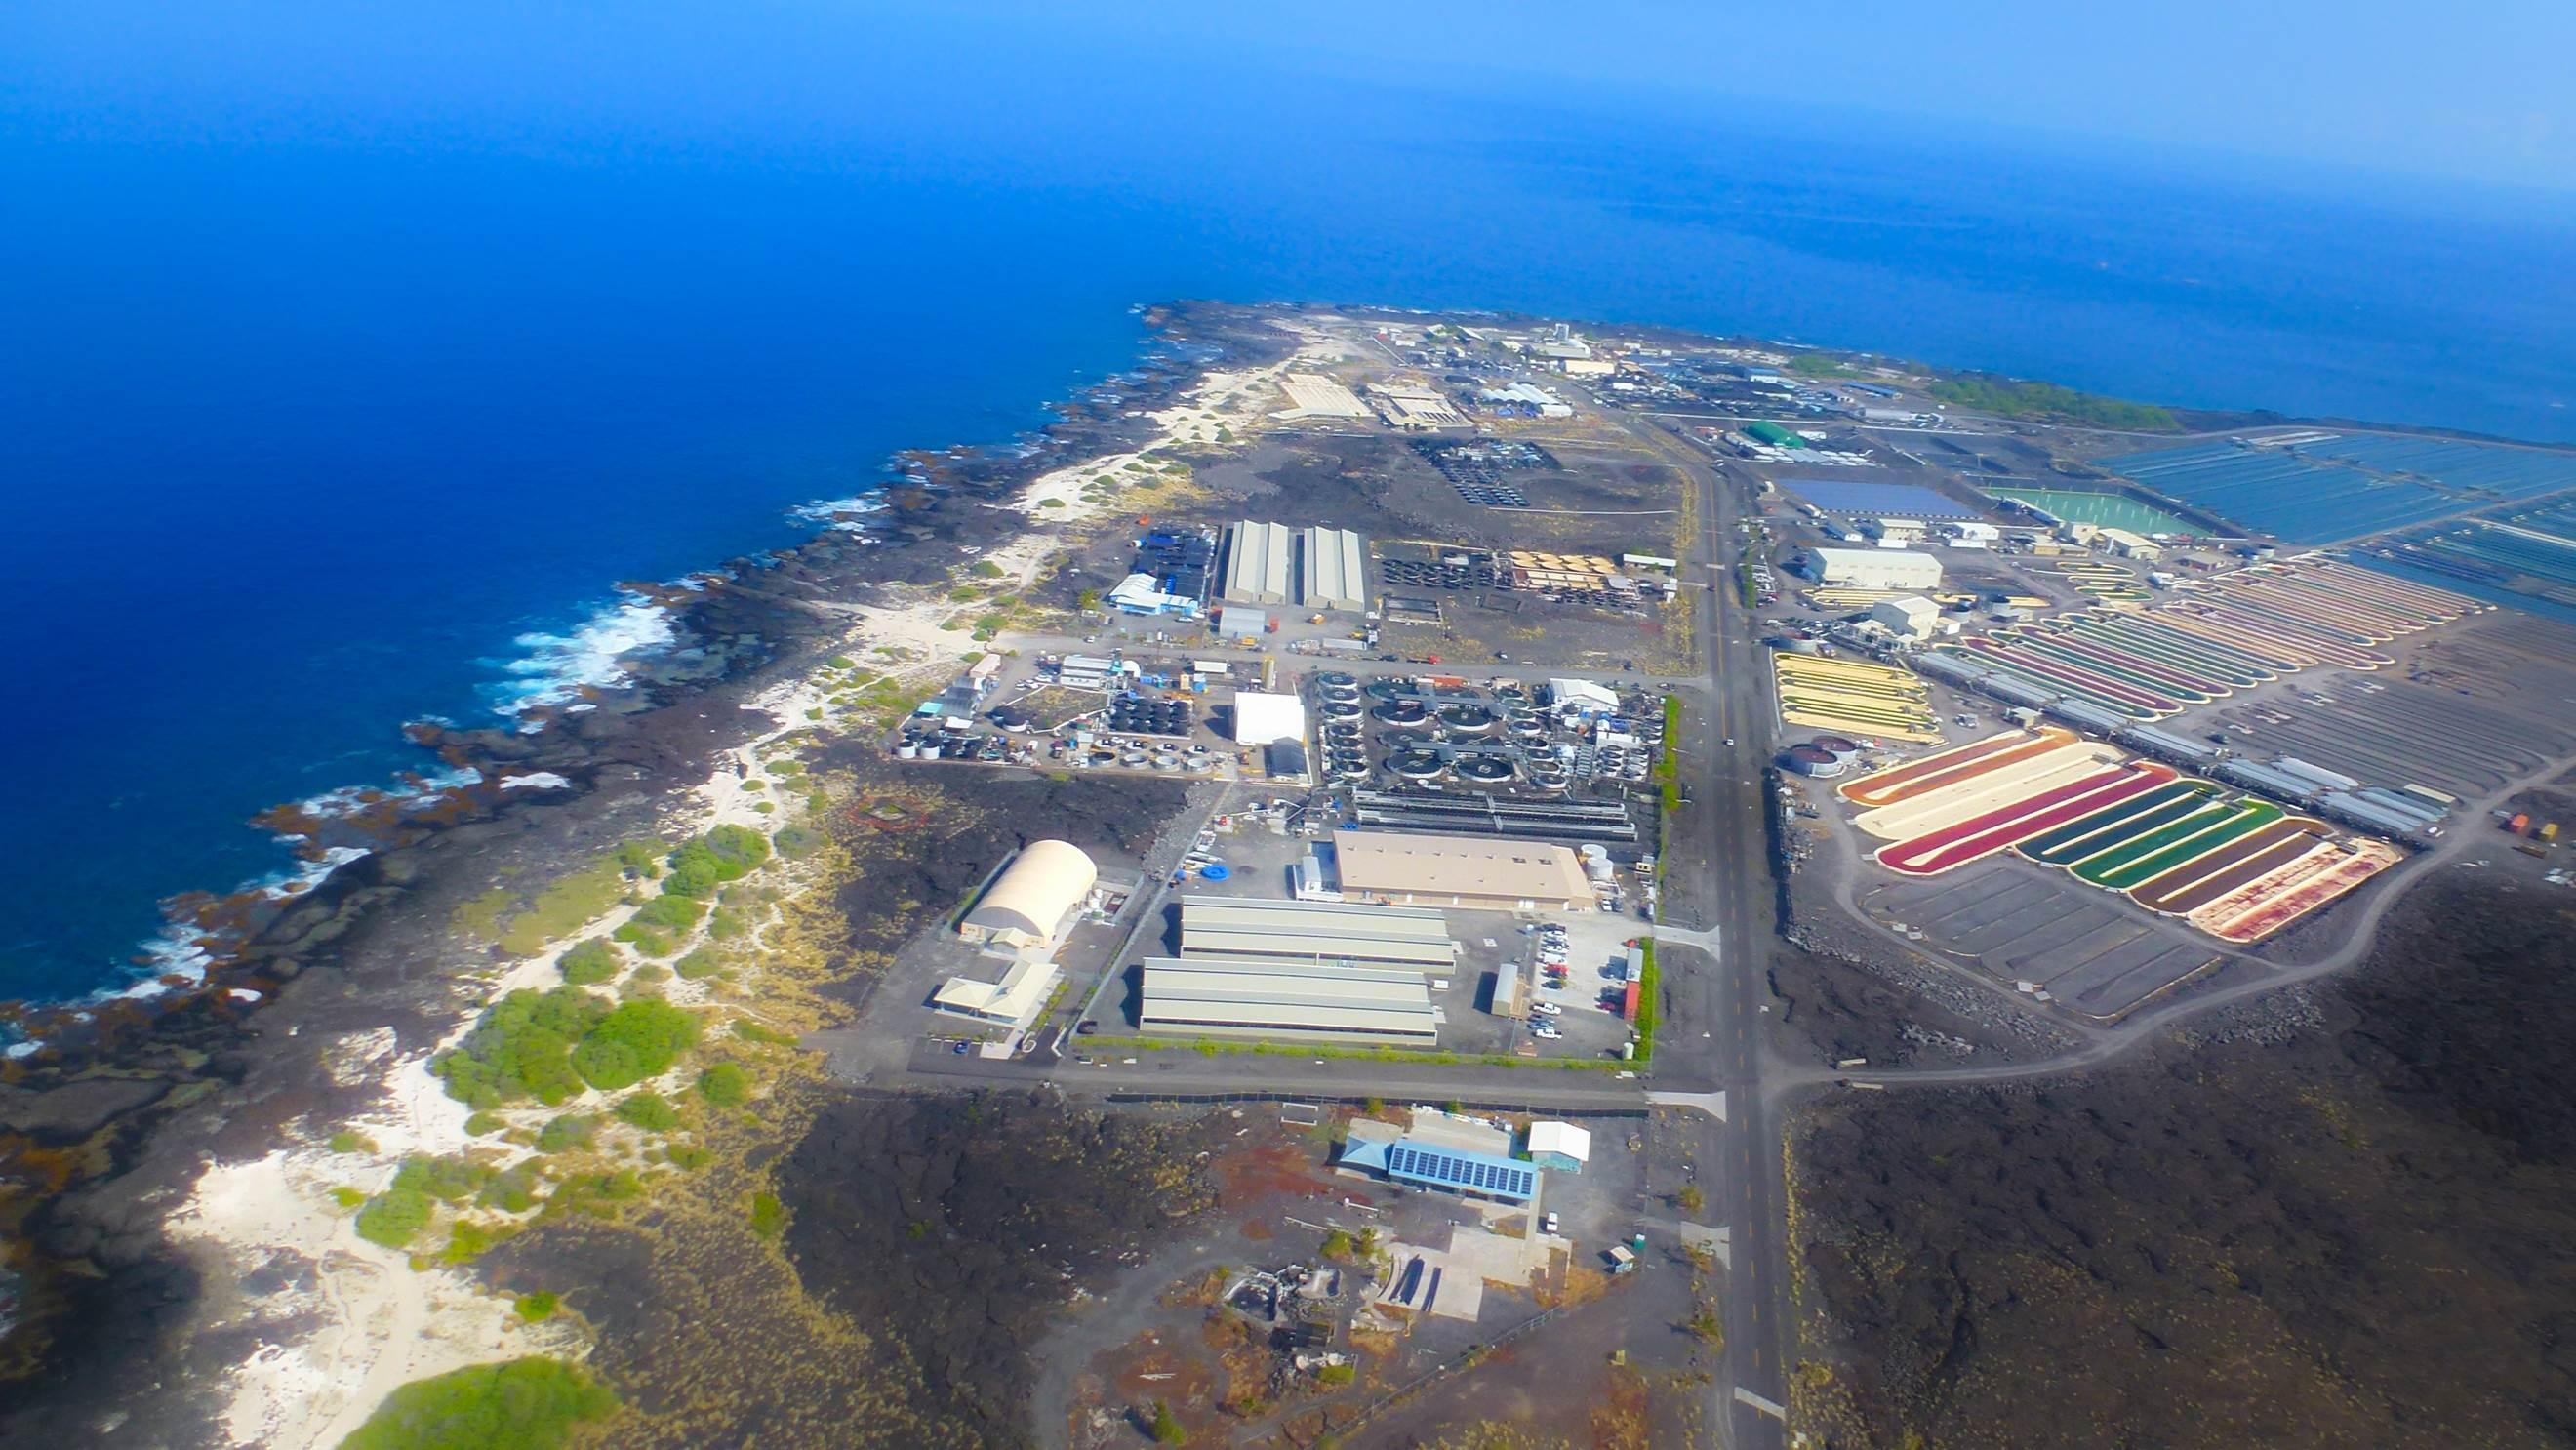 hawaii aquaculture technology park science island ocean shrimp farms bigislandnow strategic partnership expand growth global unique farm university companies